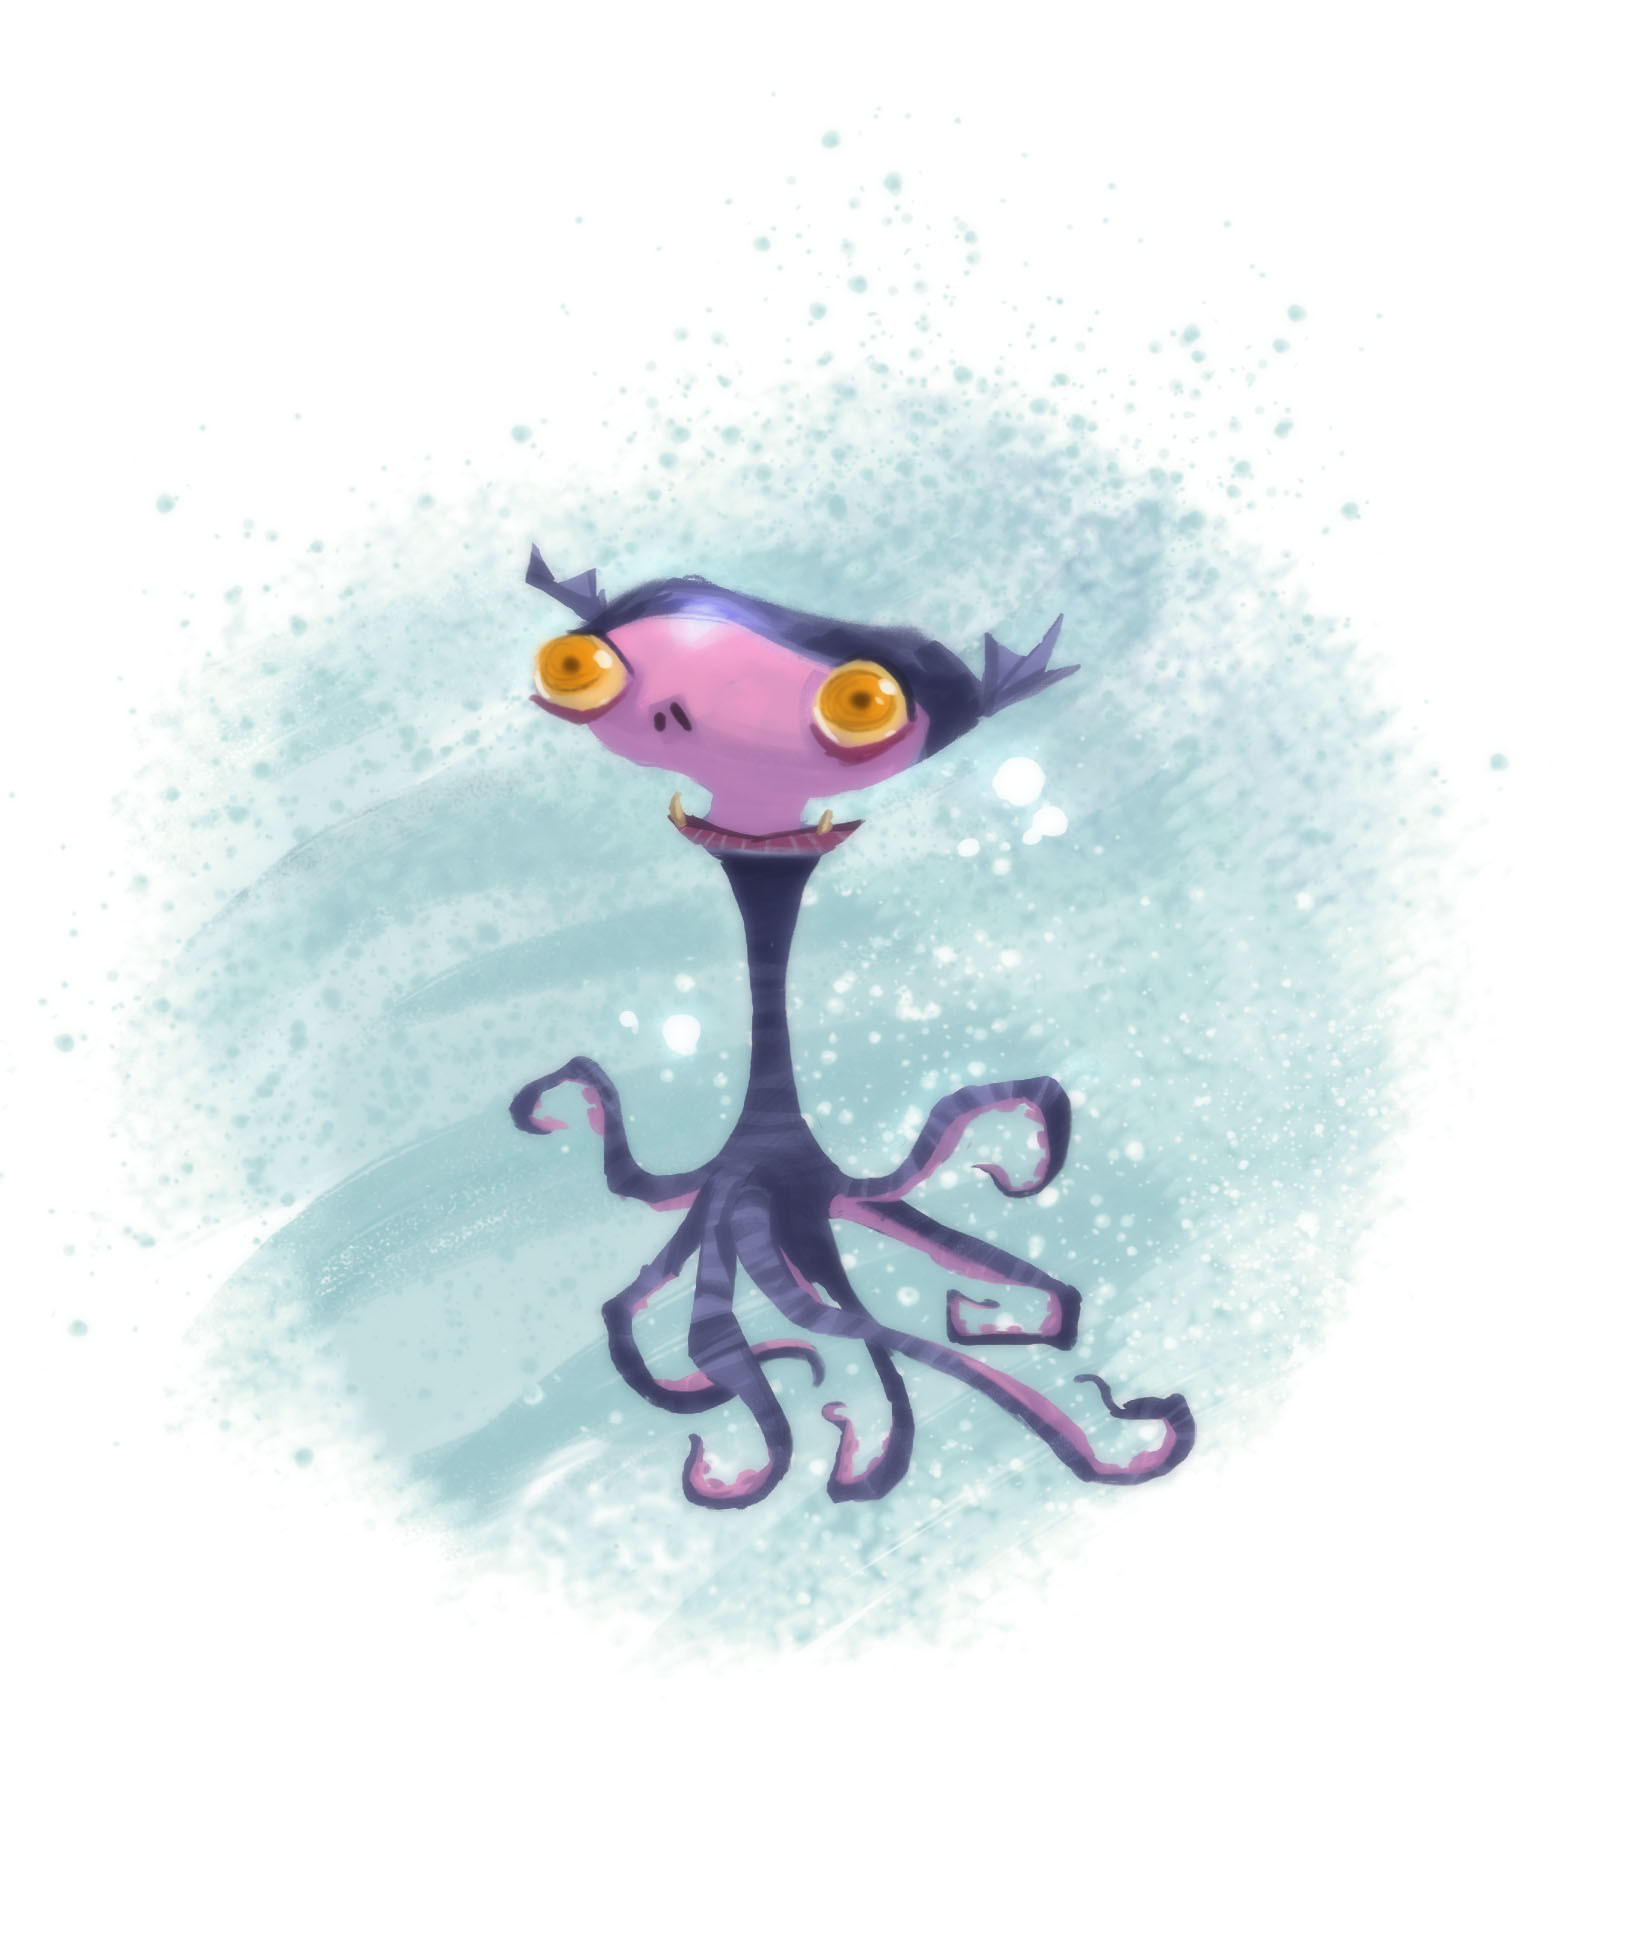 Rustam hasanov octopus